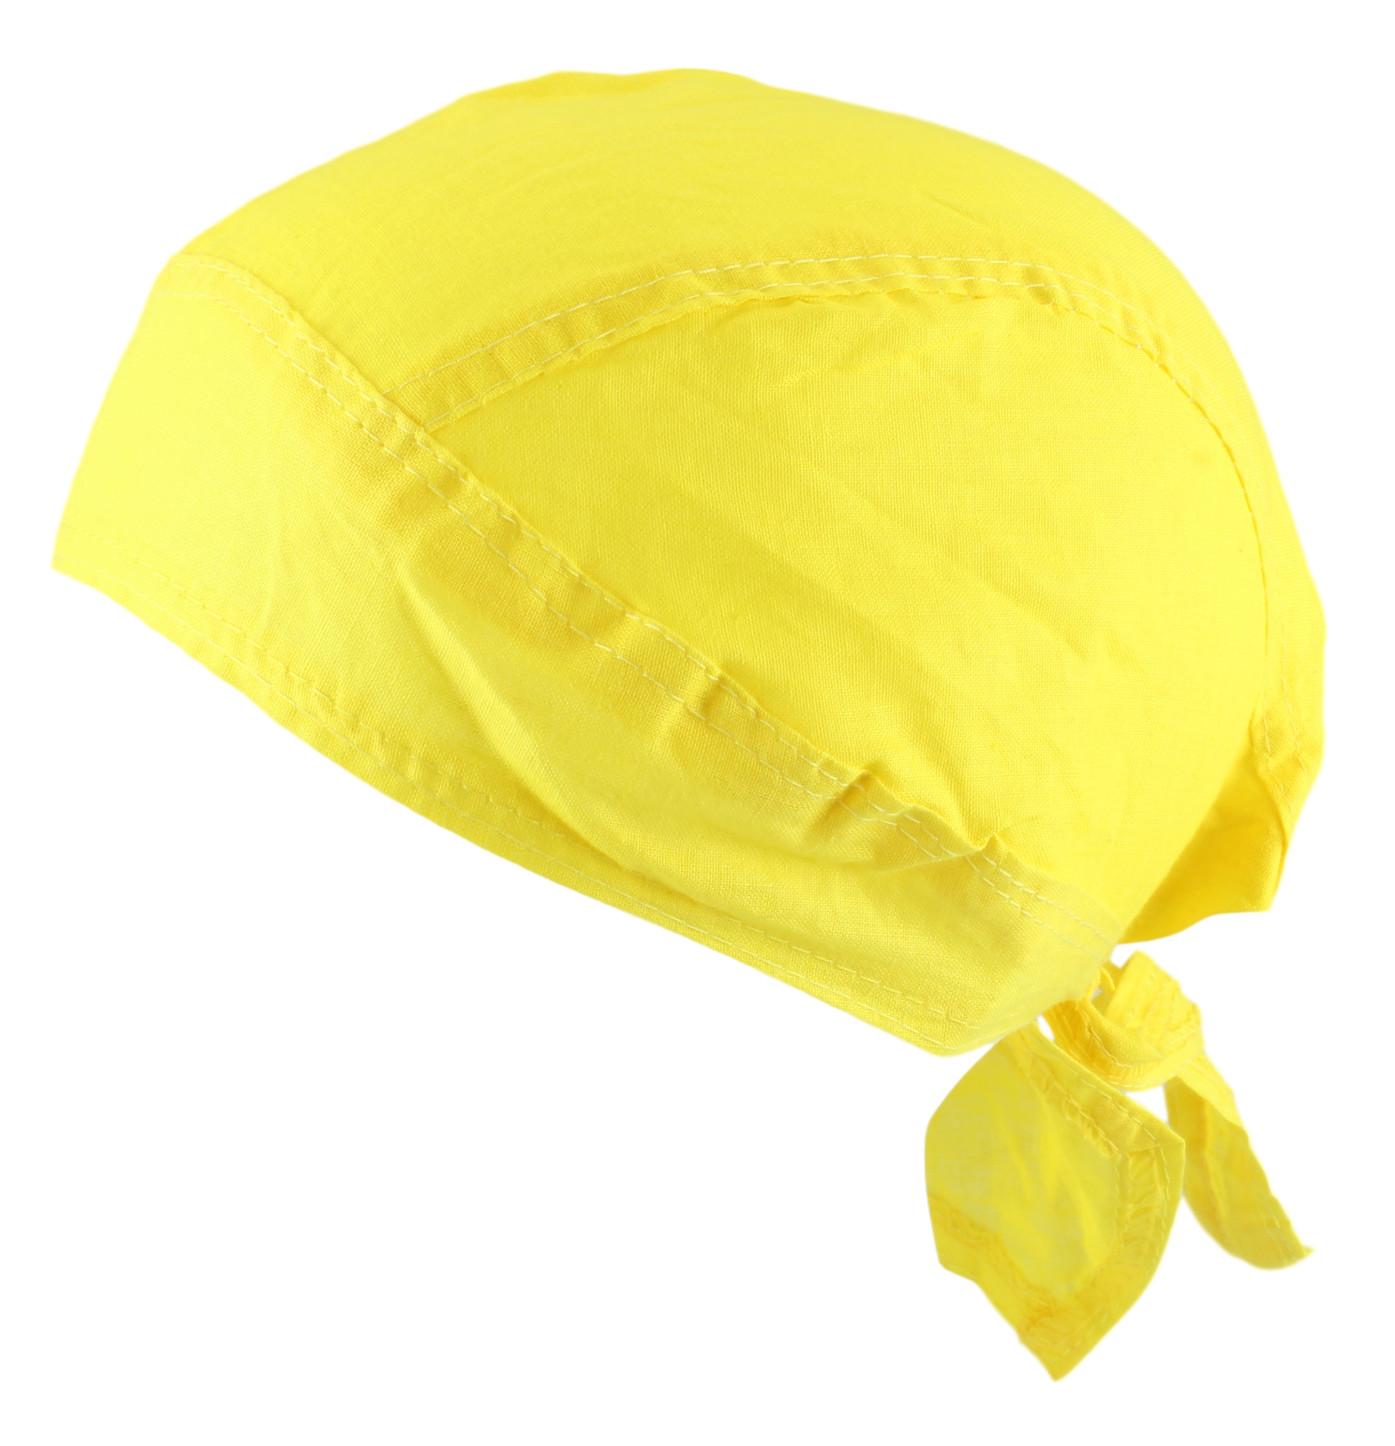 bandana cap zandana kopftuch biker hut hat durag 100. Black Bedroom Furniture Sets. Home Design Ideas